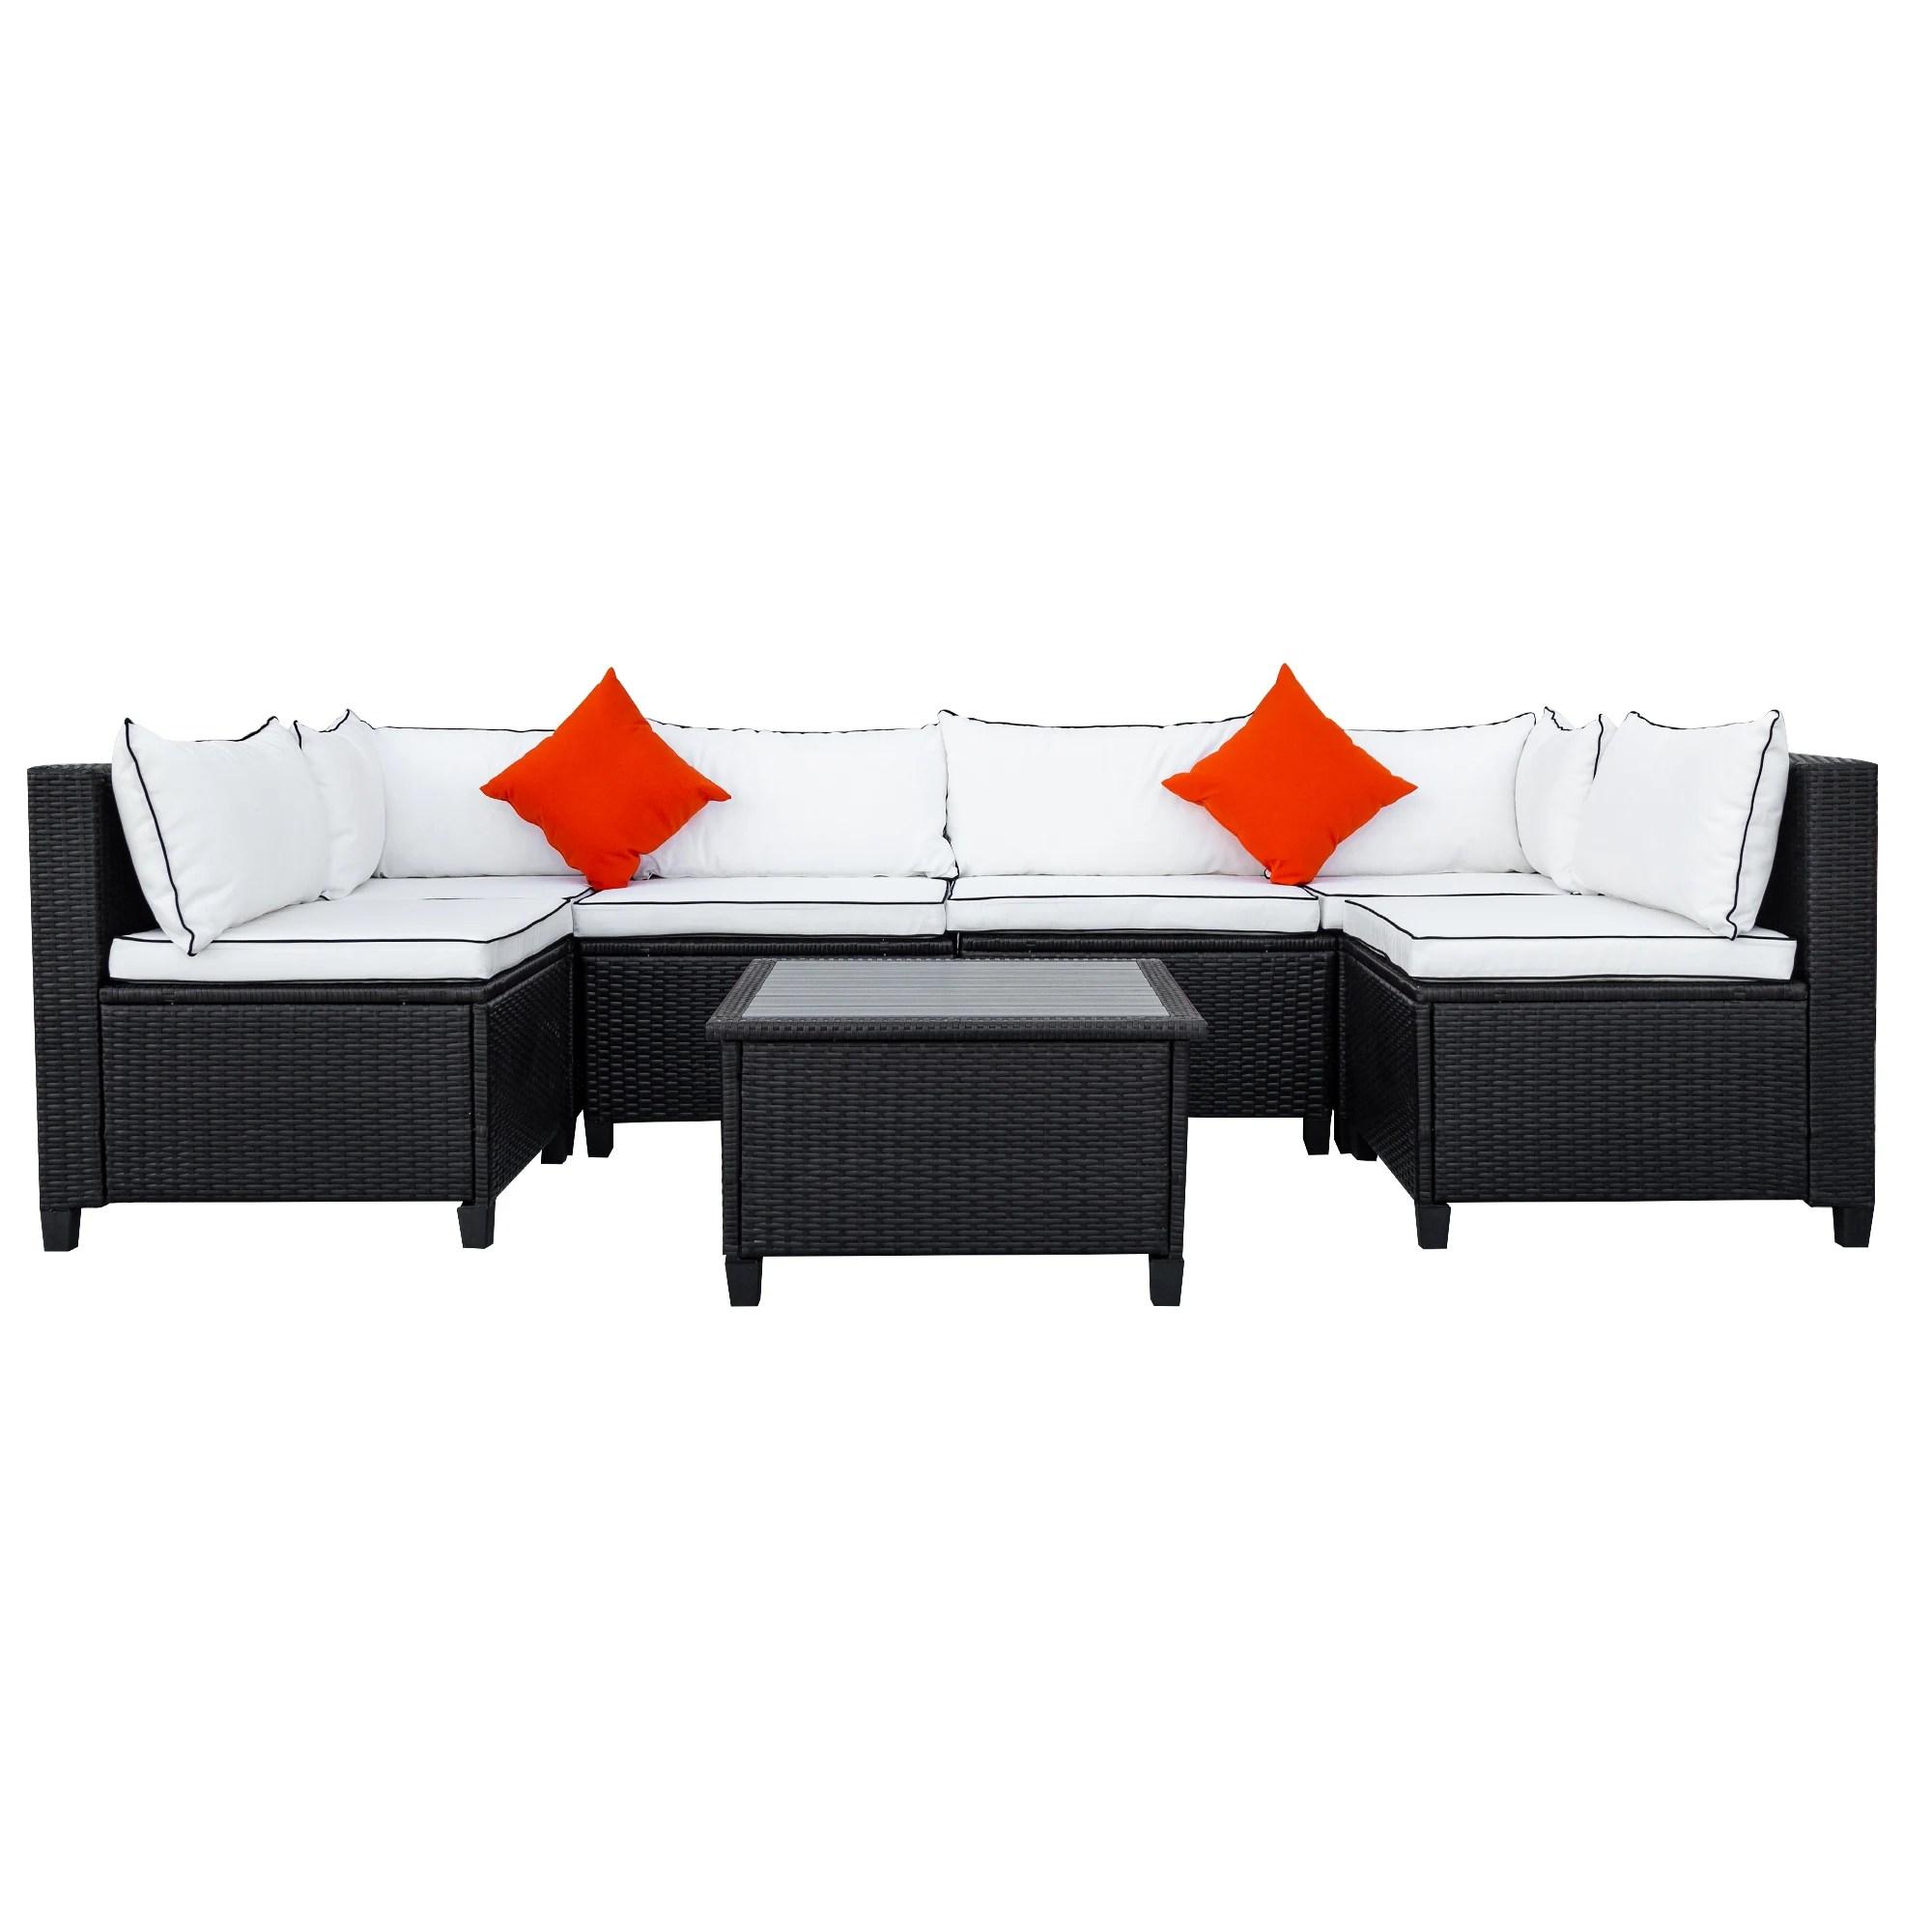 u shape quality rattan wicker sectional patio outdoor furniture set